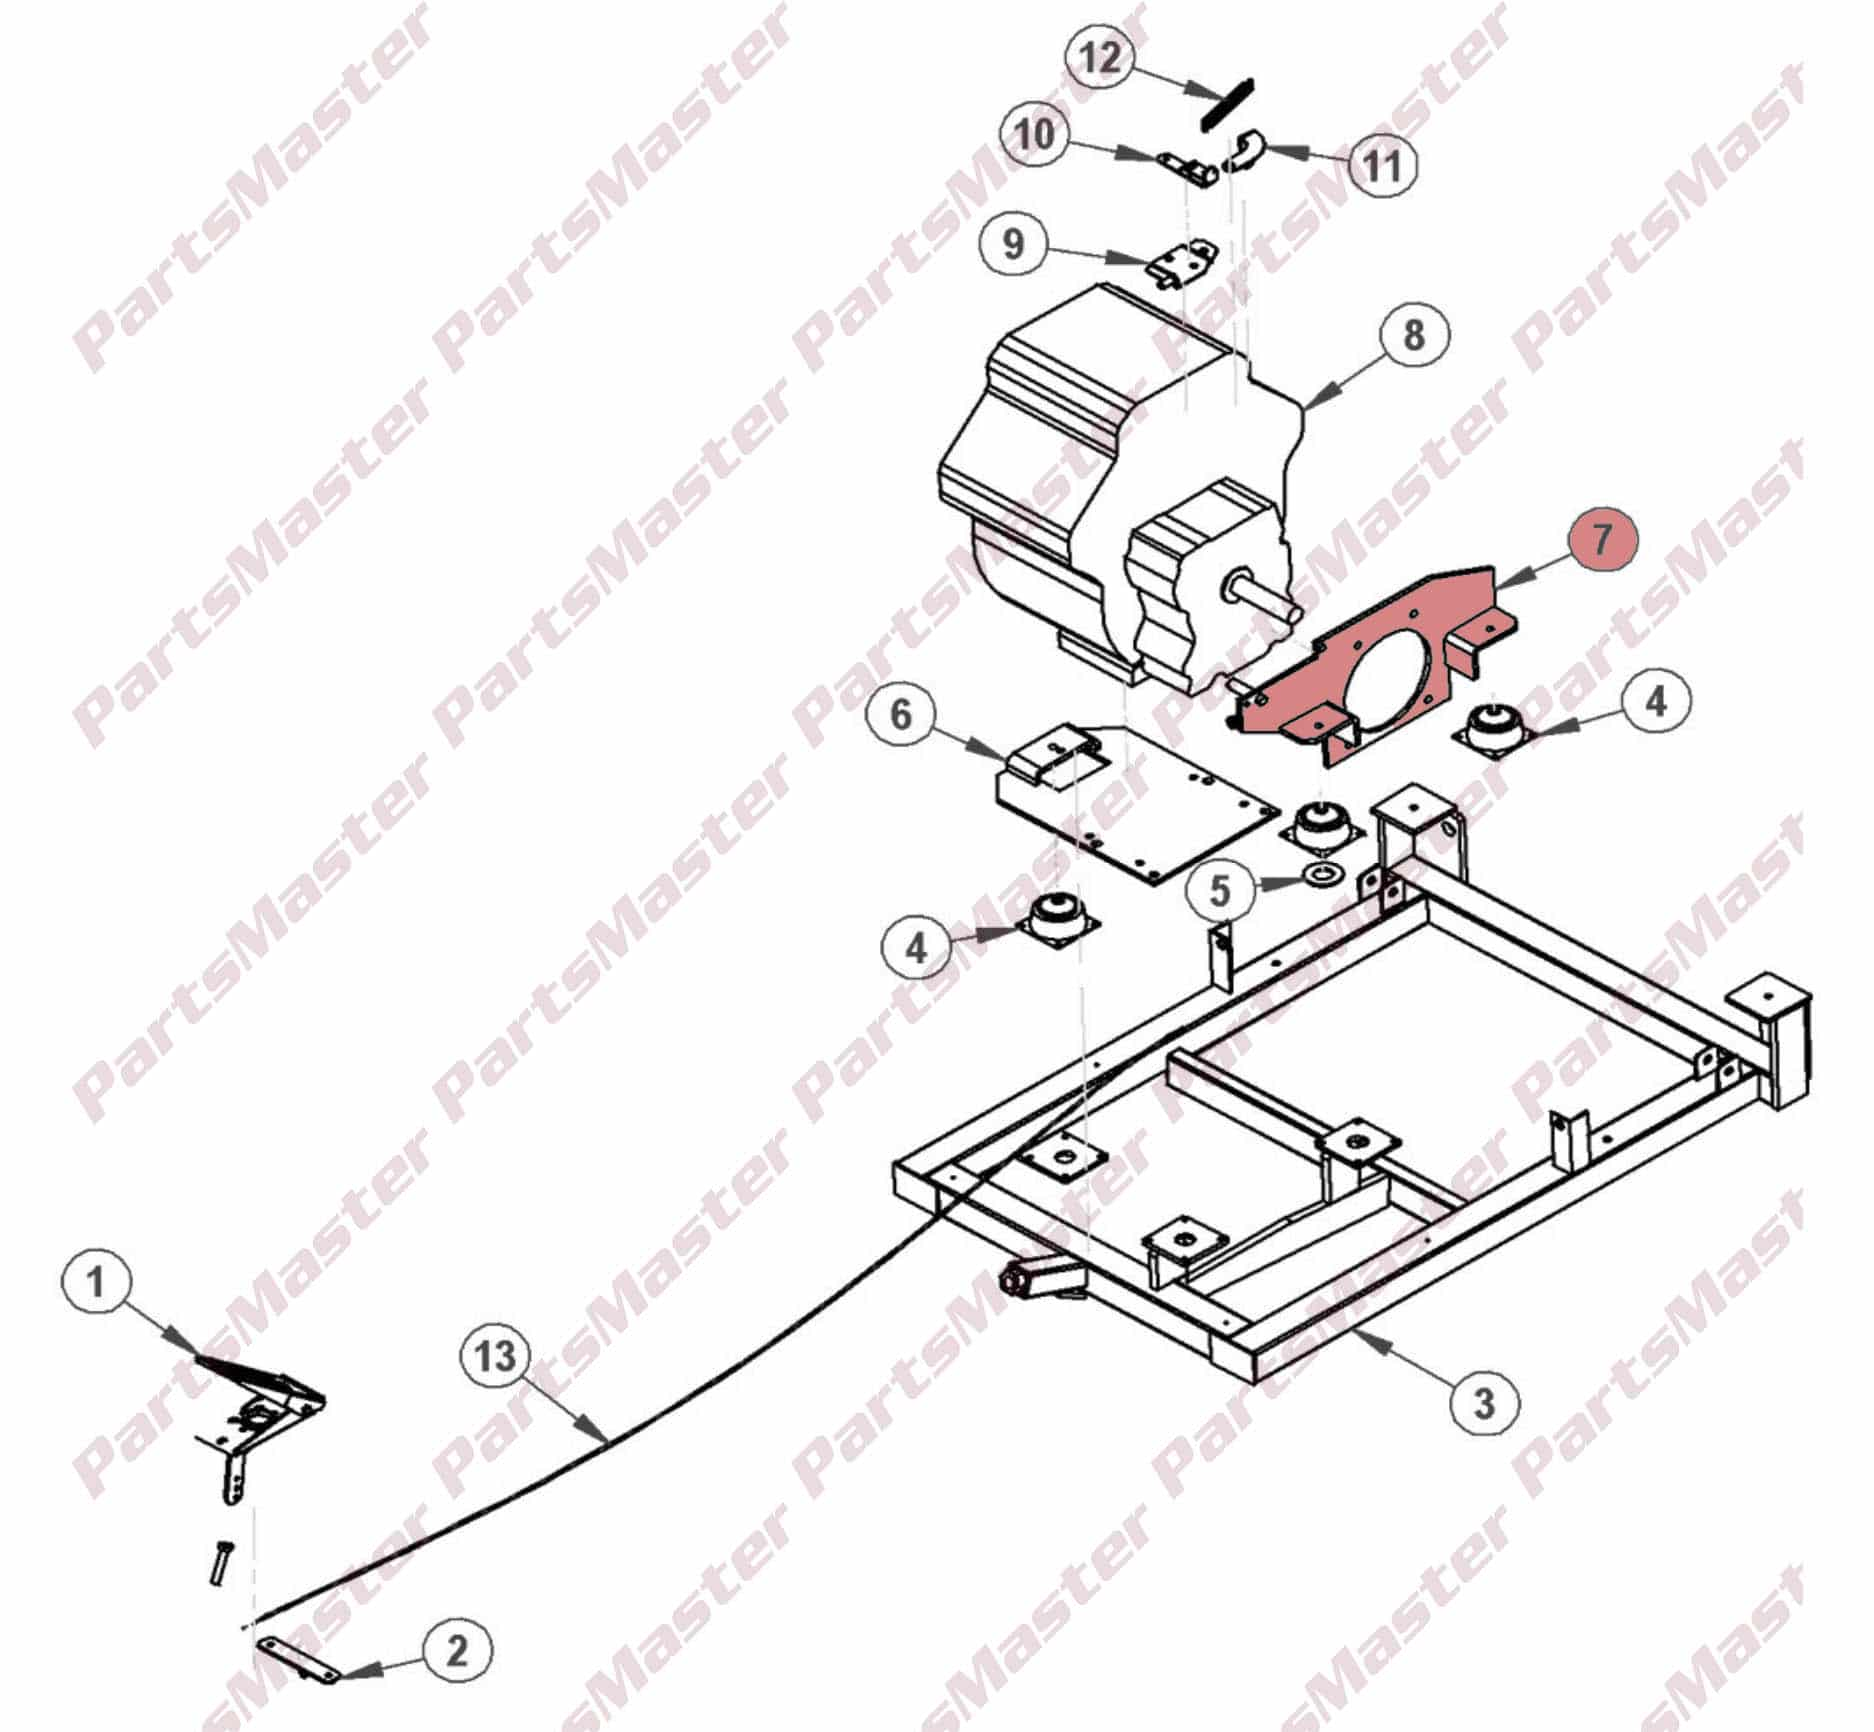 hight resolution of kohler engine mount 2160301027